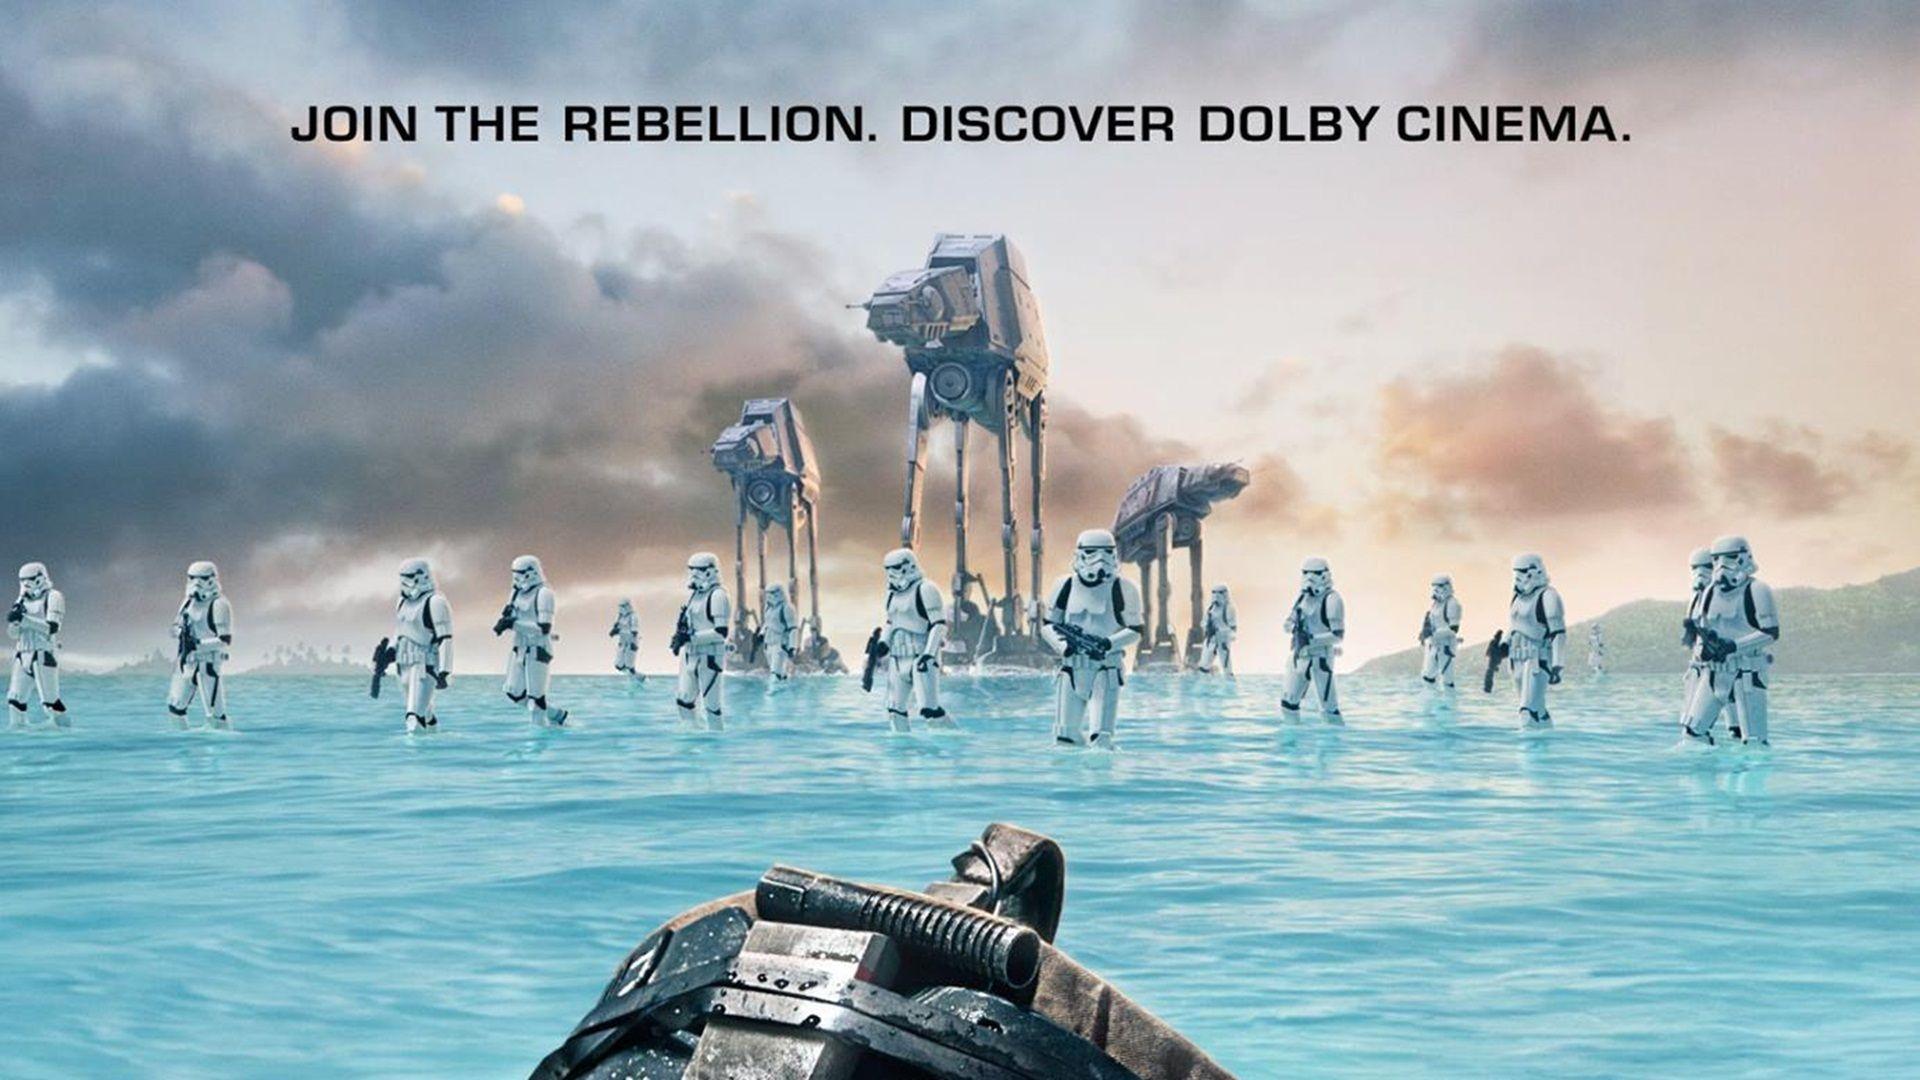 Star Wars Rogue One Wallpaper: Top Star Wars Rogue One Wallpapers My Free Wallpapers Hub